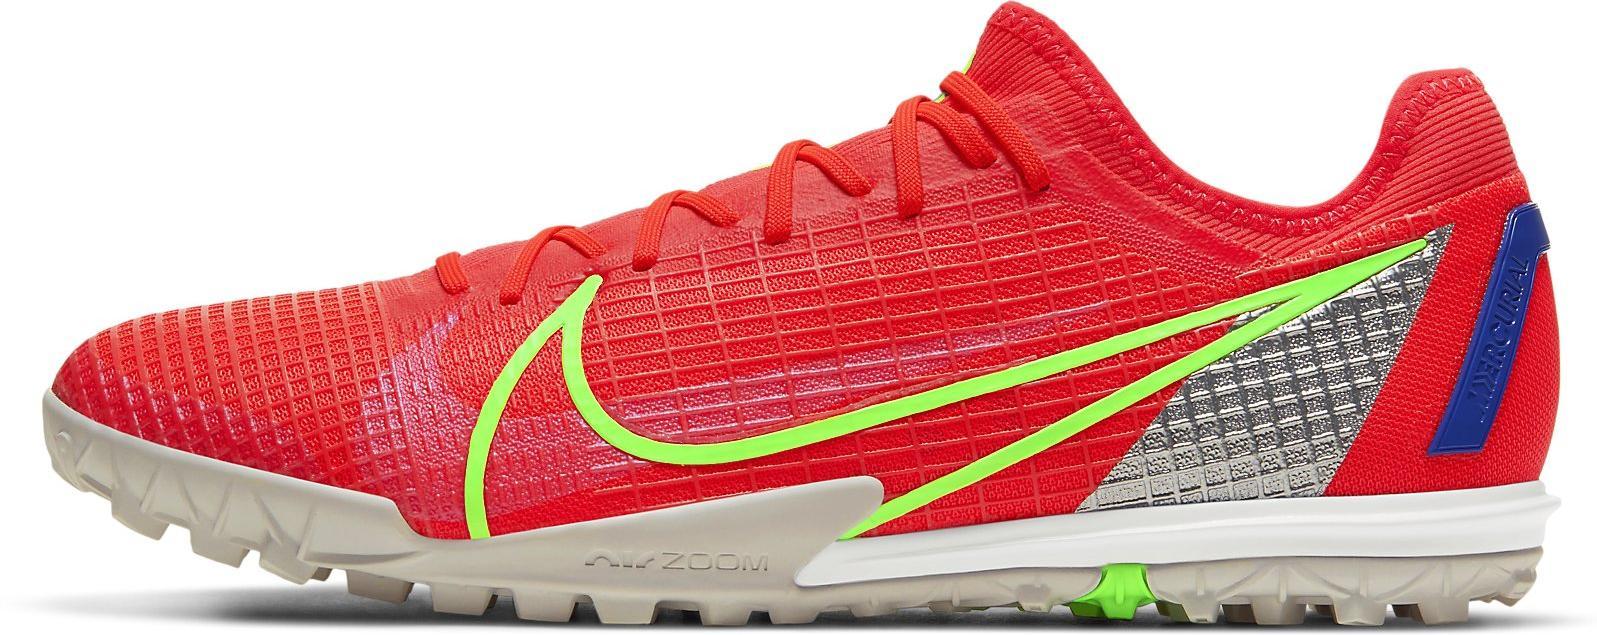 Kopačky Nike Mercurial Vapor 14 Pro TF